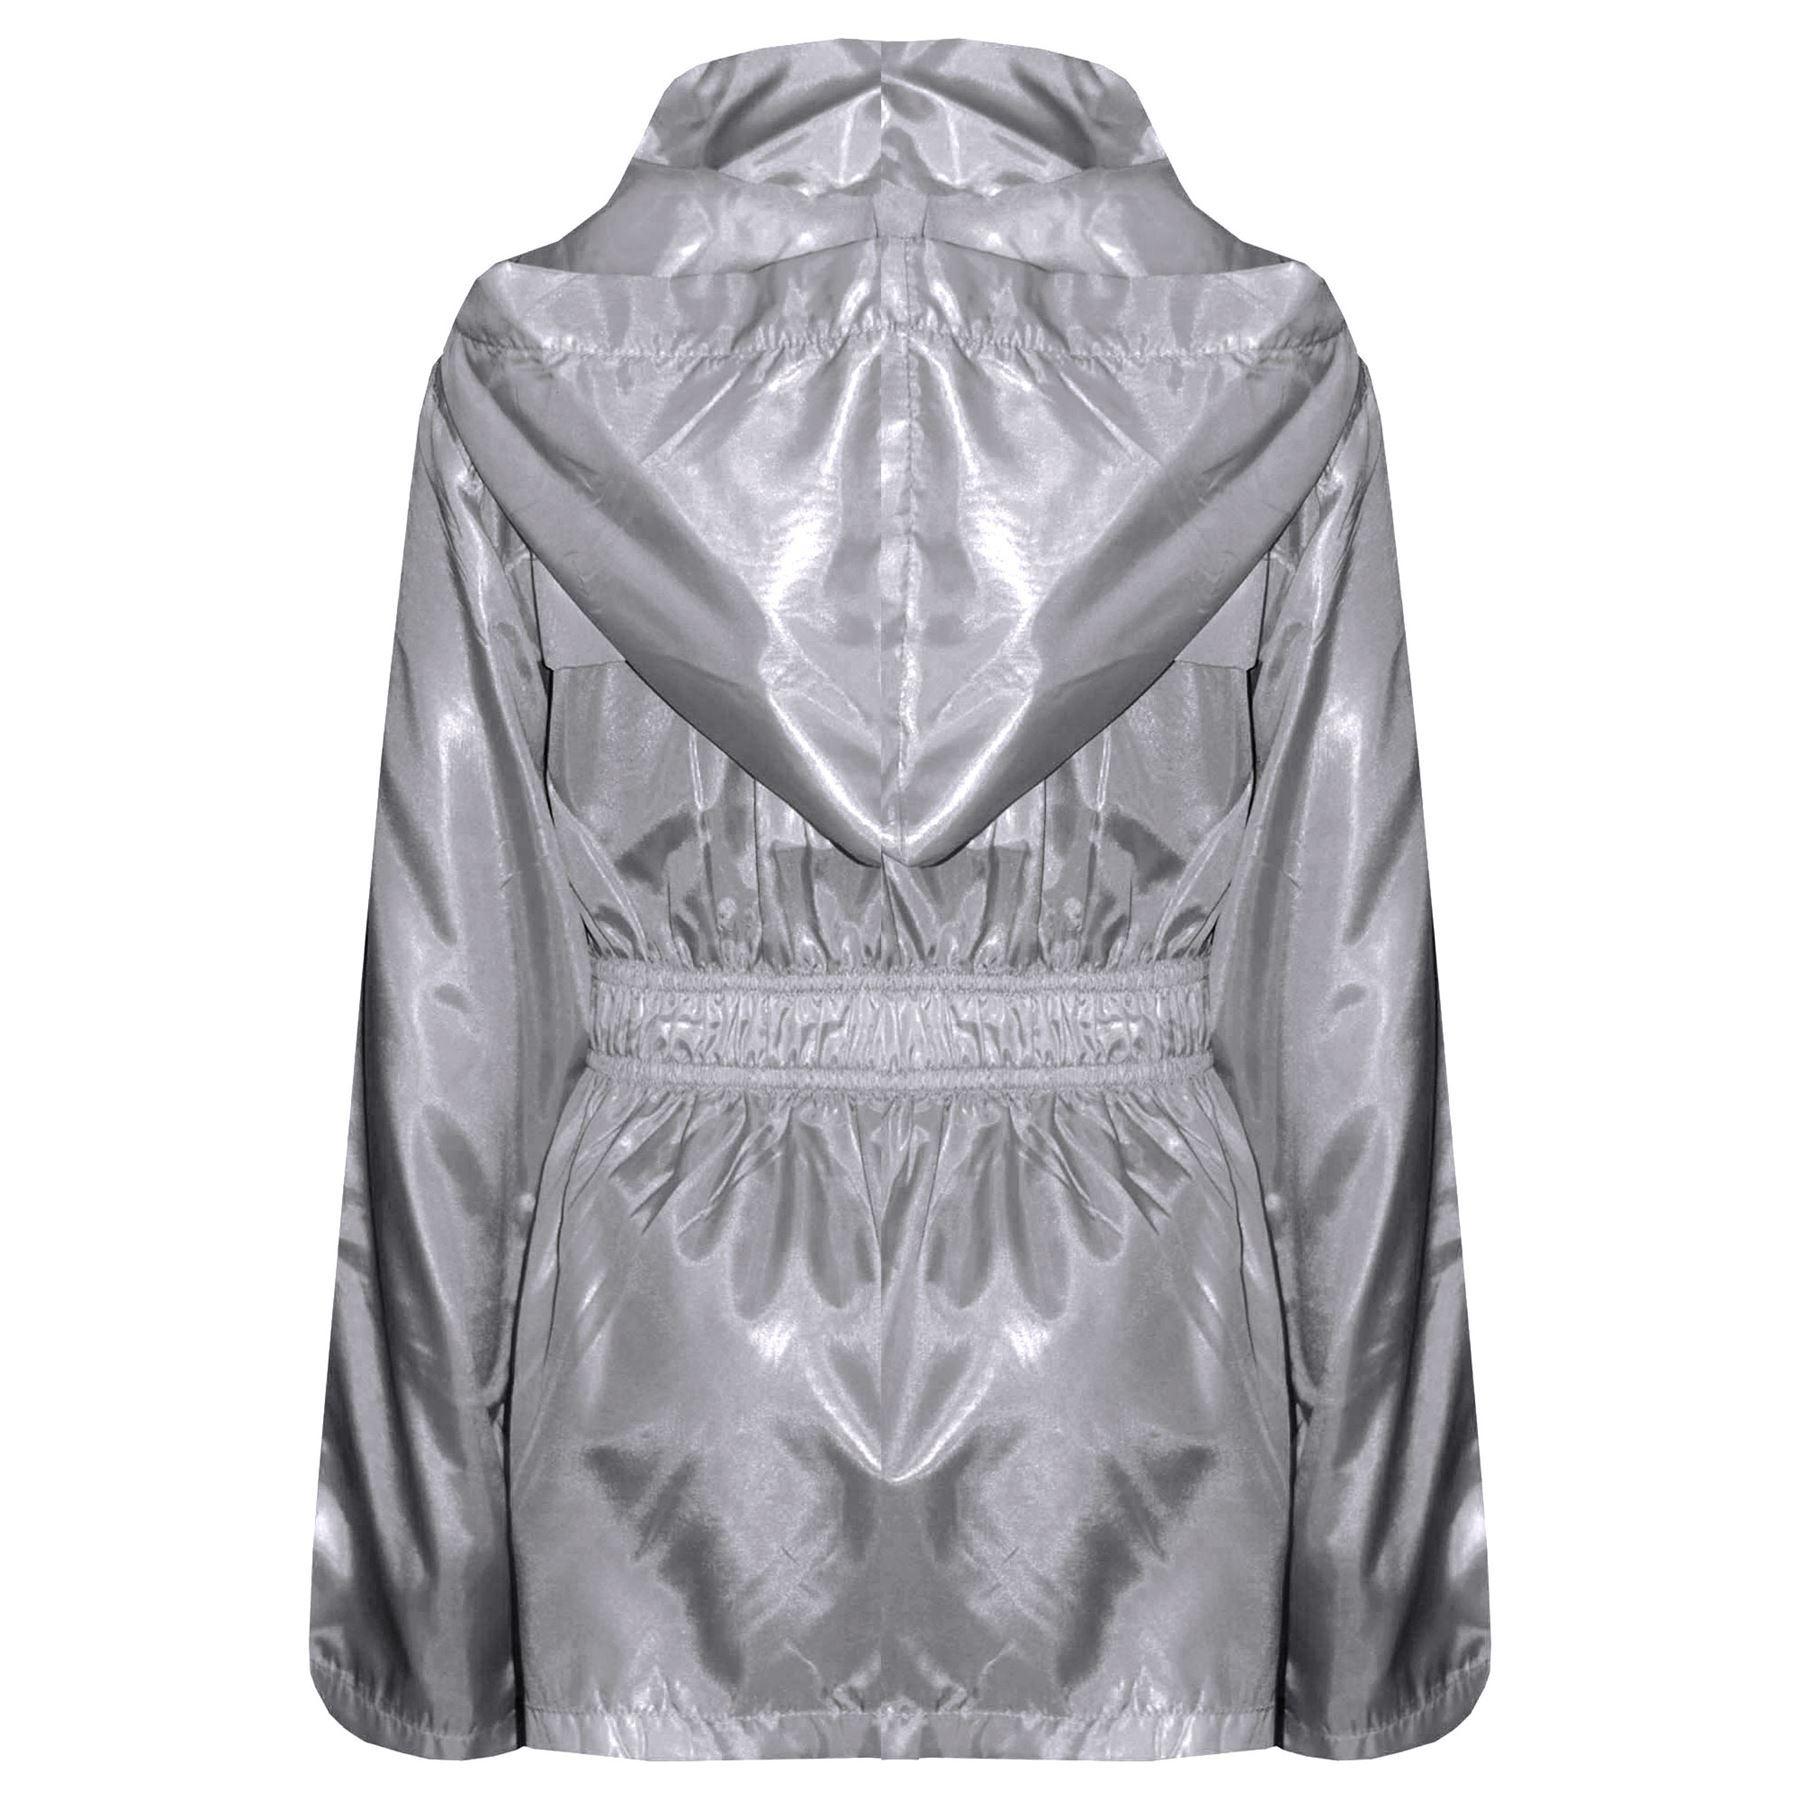 Kids Girls Boys Raincoats Jackets Grey Lightweight Hooded Cagoule Rain Mac 5-13Y